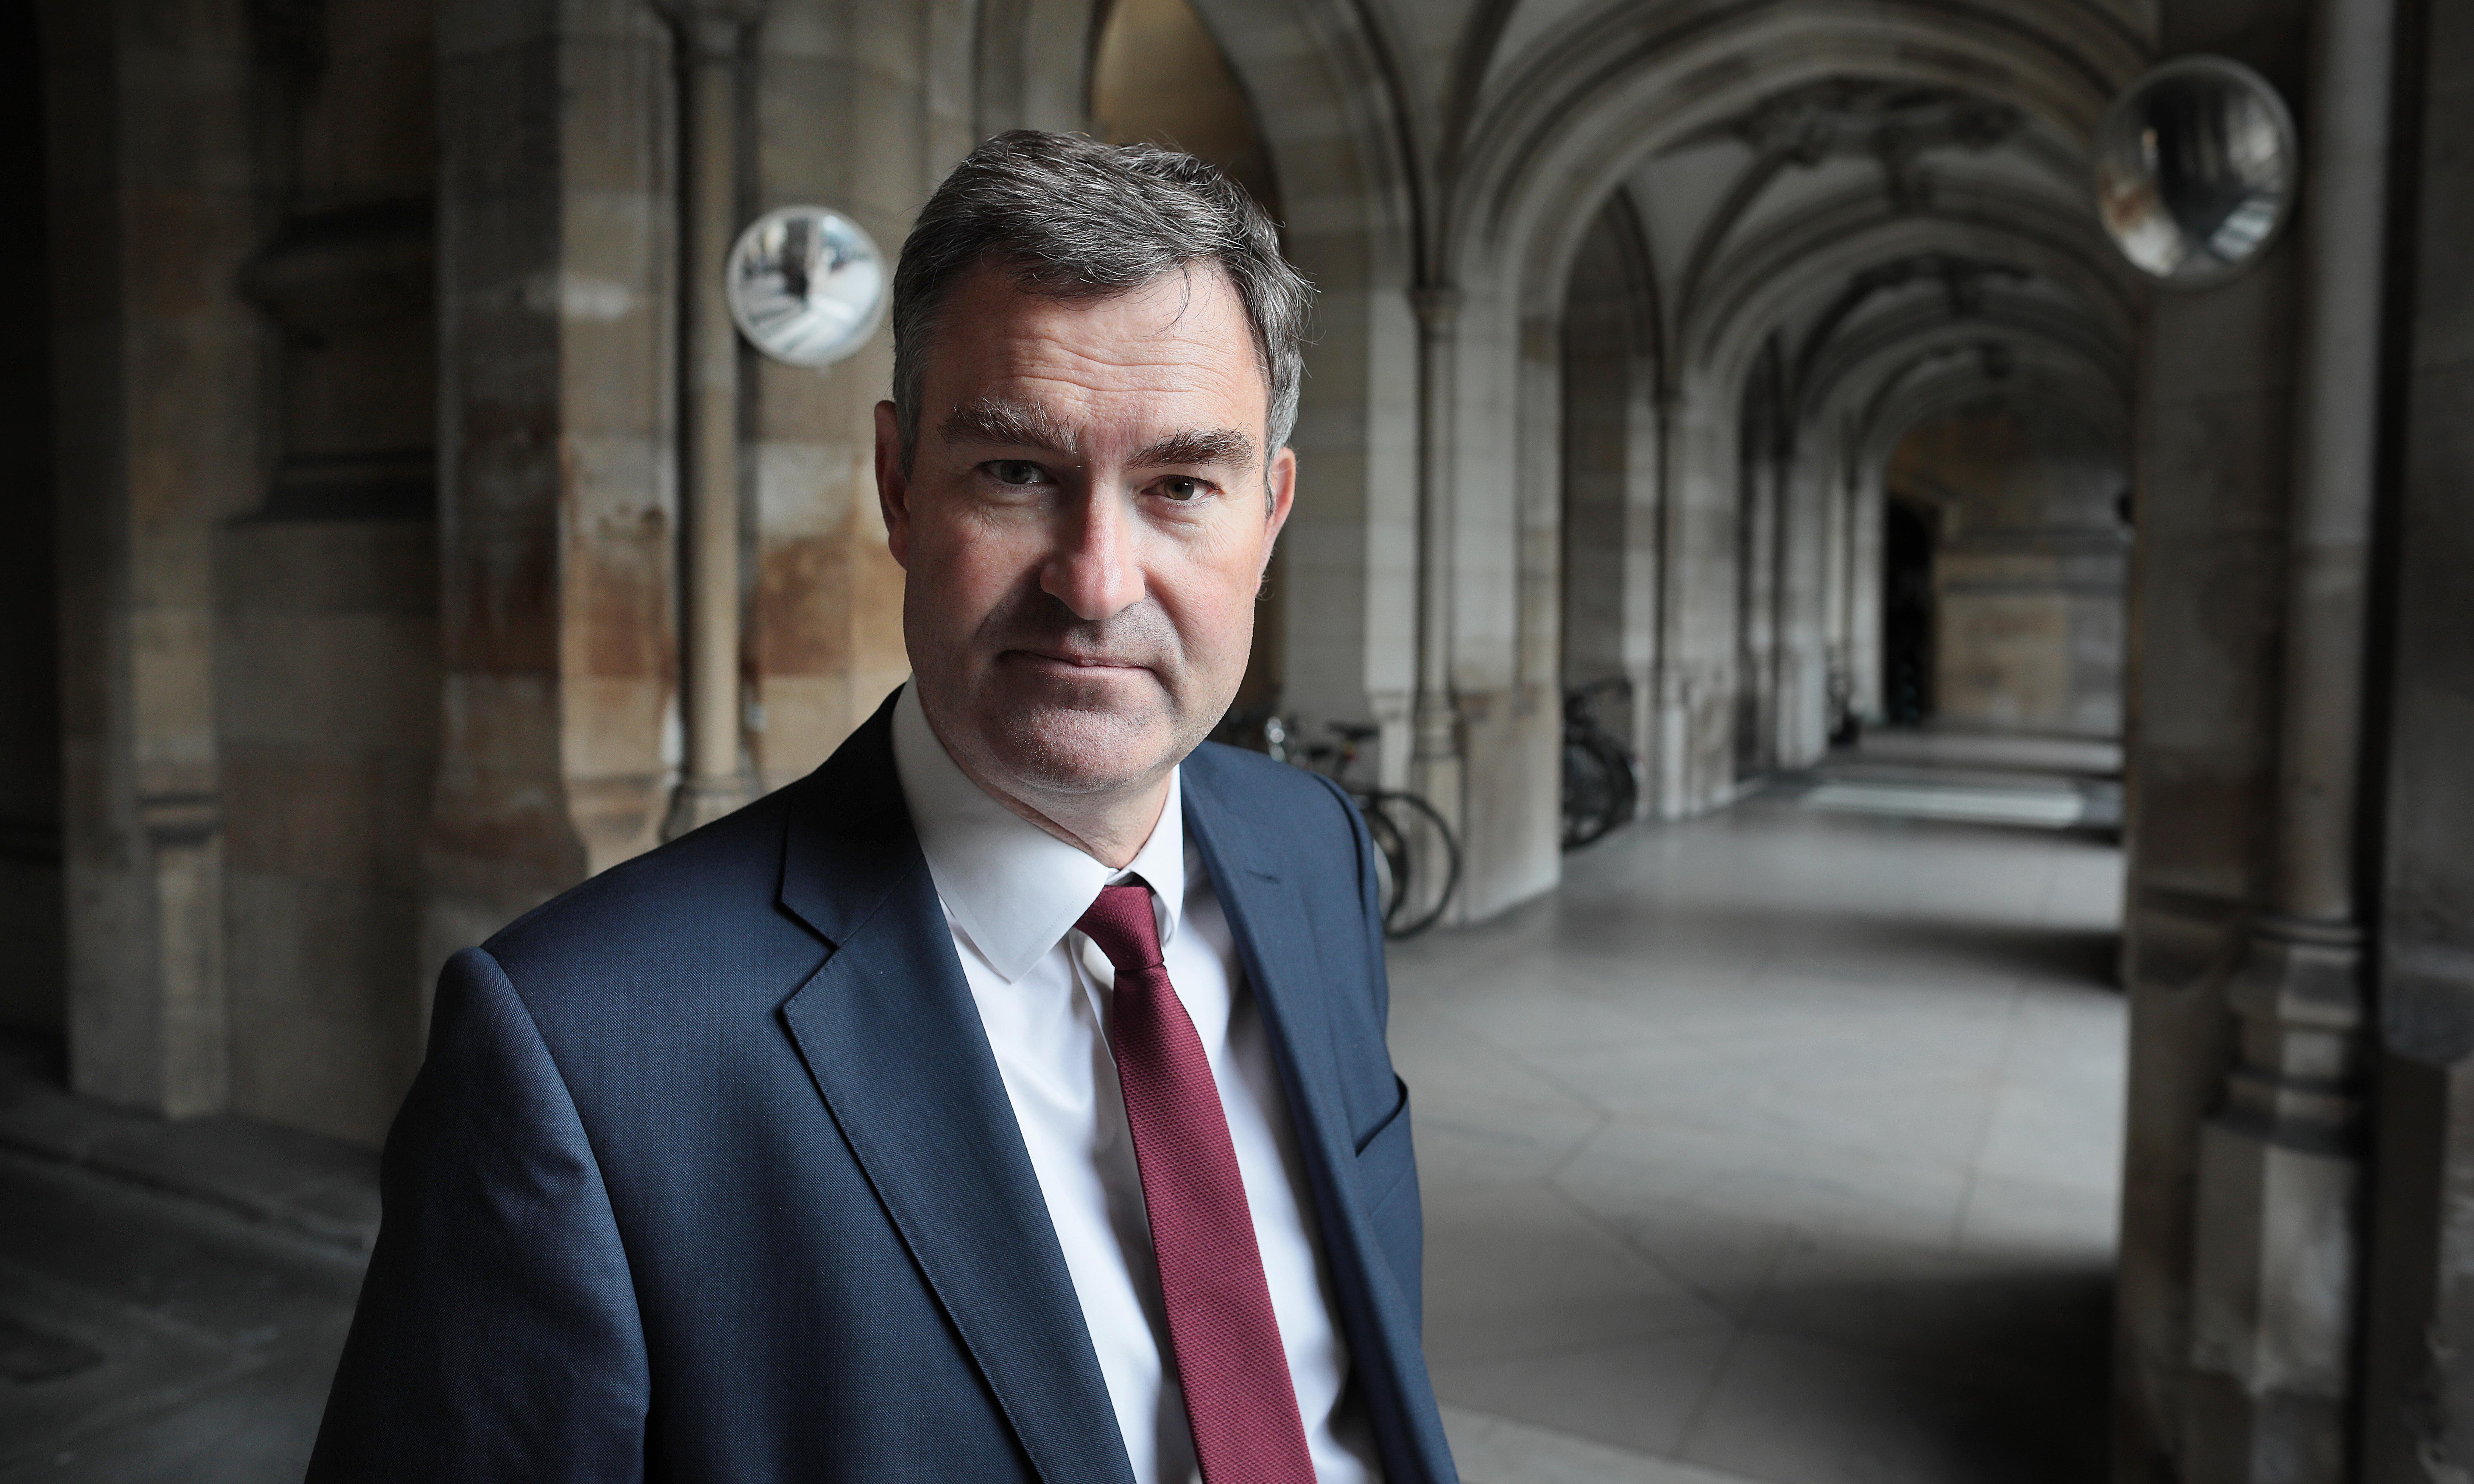 Gauke: Johnson risks millions of votes with 'Farage-lite' strategy